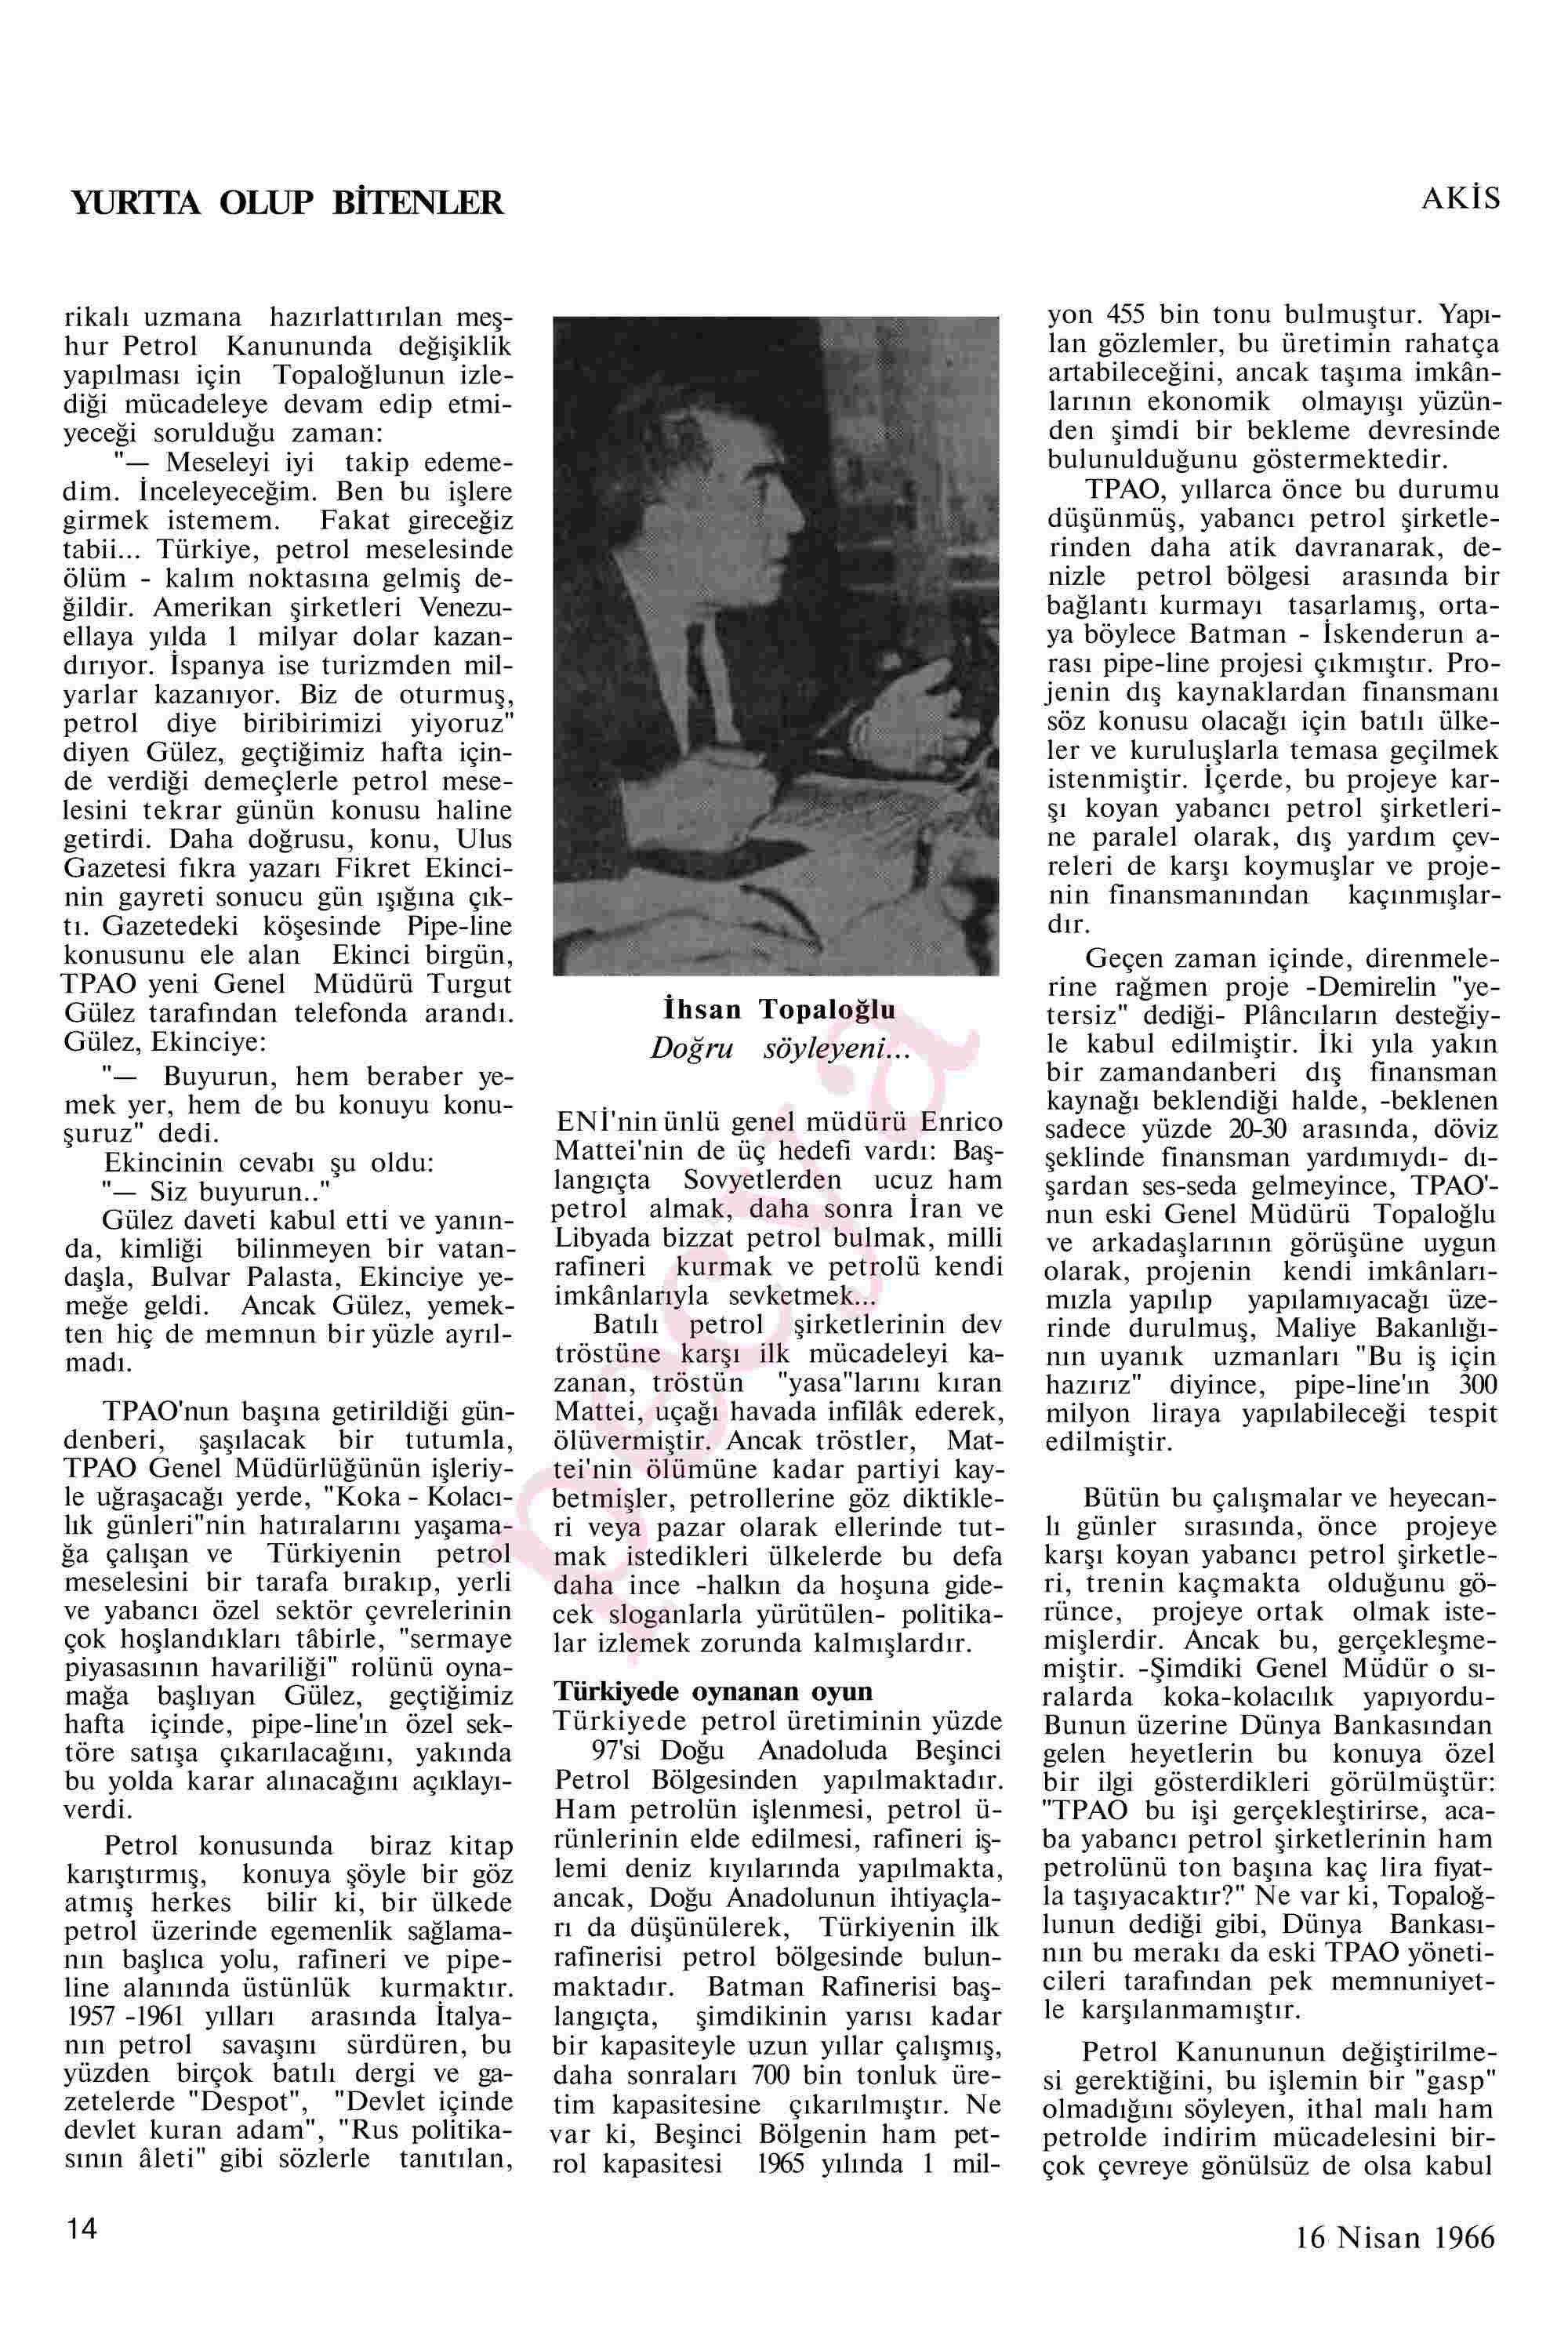 16 Nisan 1966 Tarihli Akis Dergisi Sayfa 14